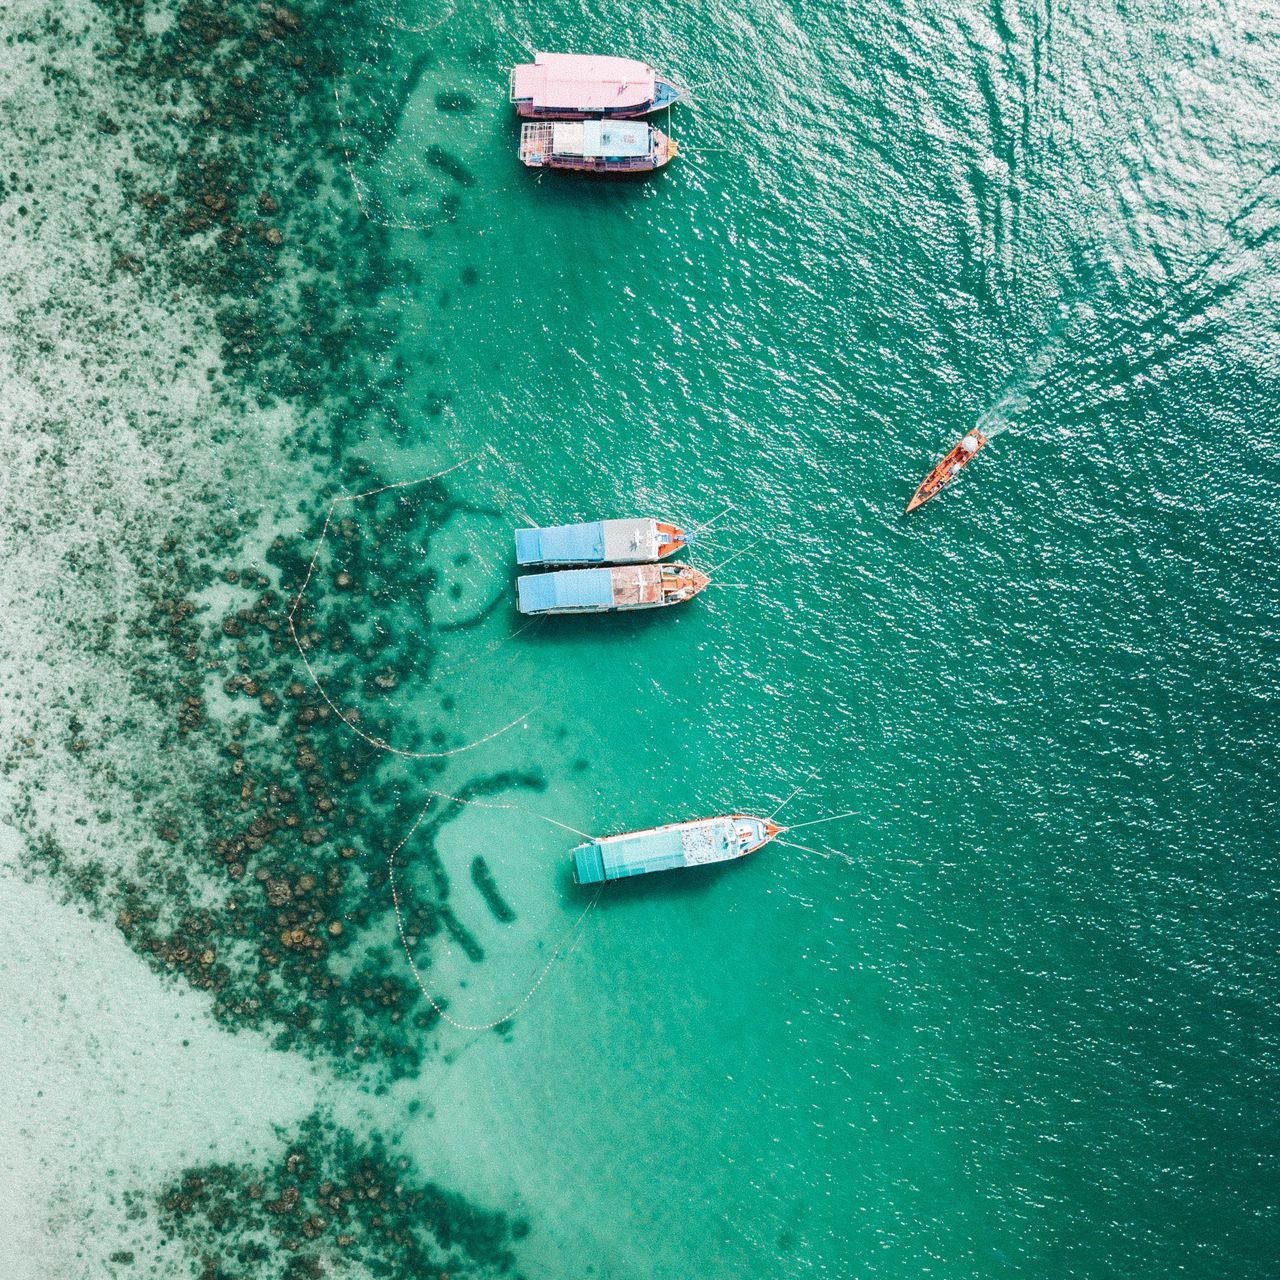 1280x1280 Wallpaper shore, boats, sandbar, ocean, moored, aerial view